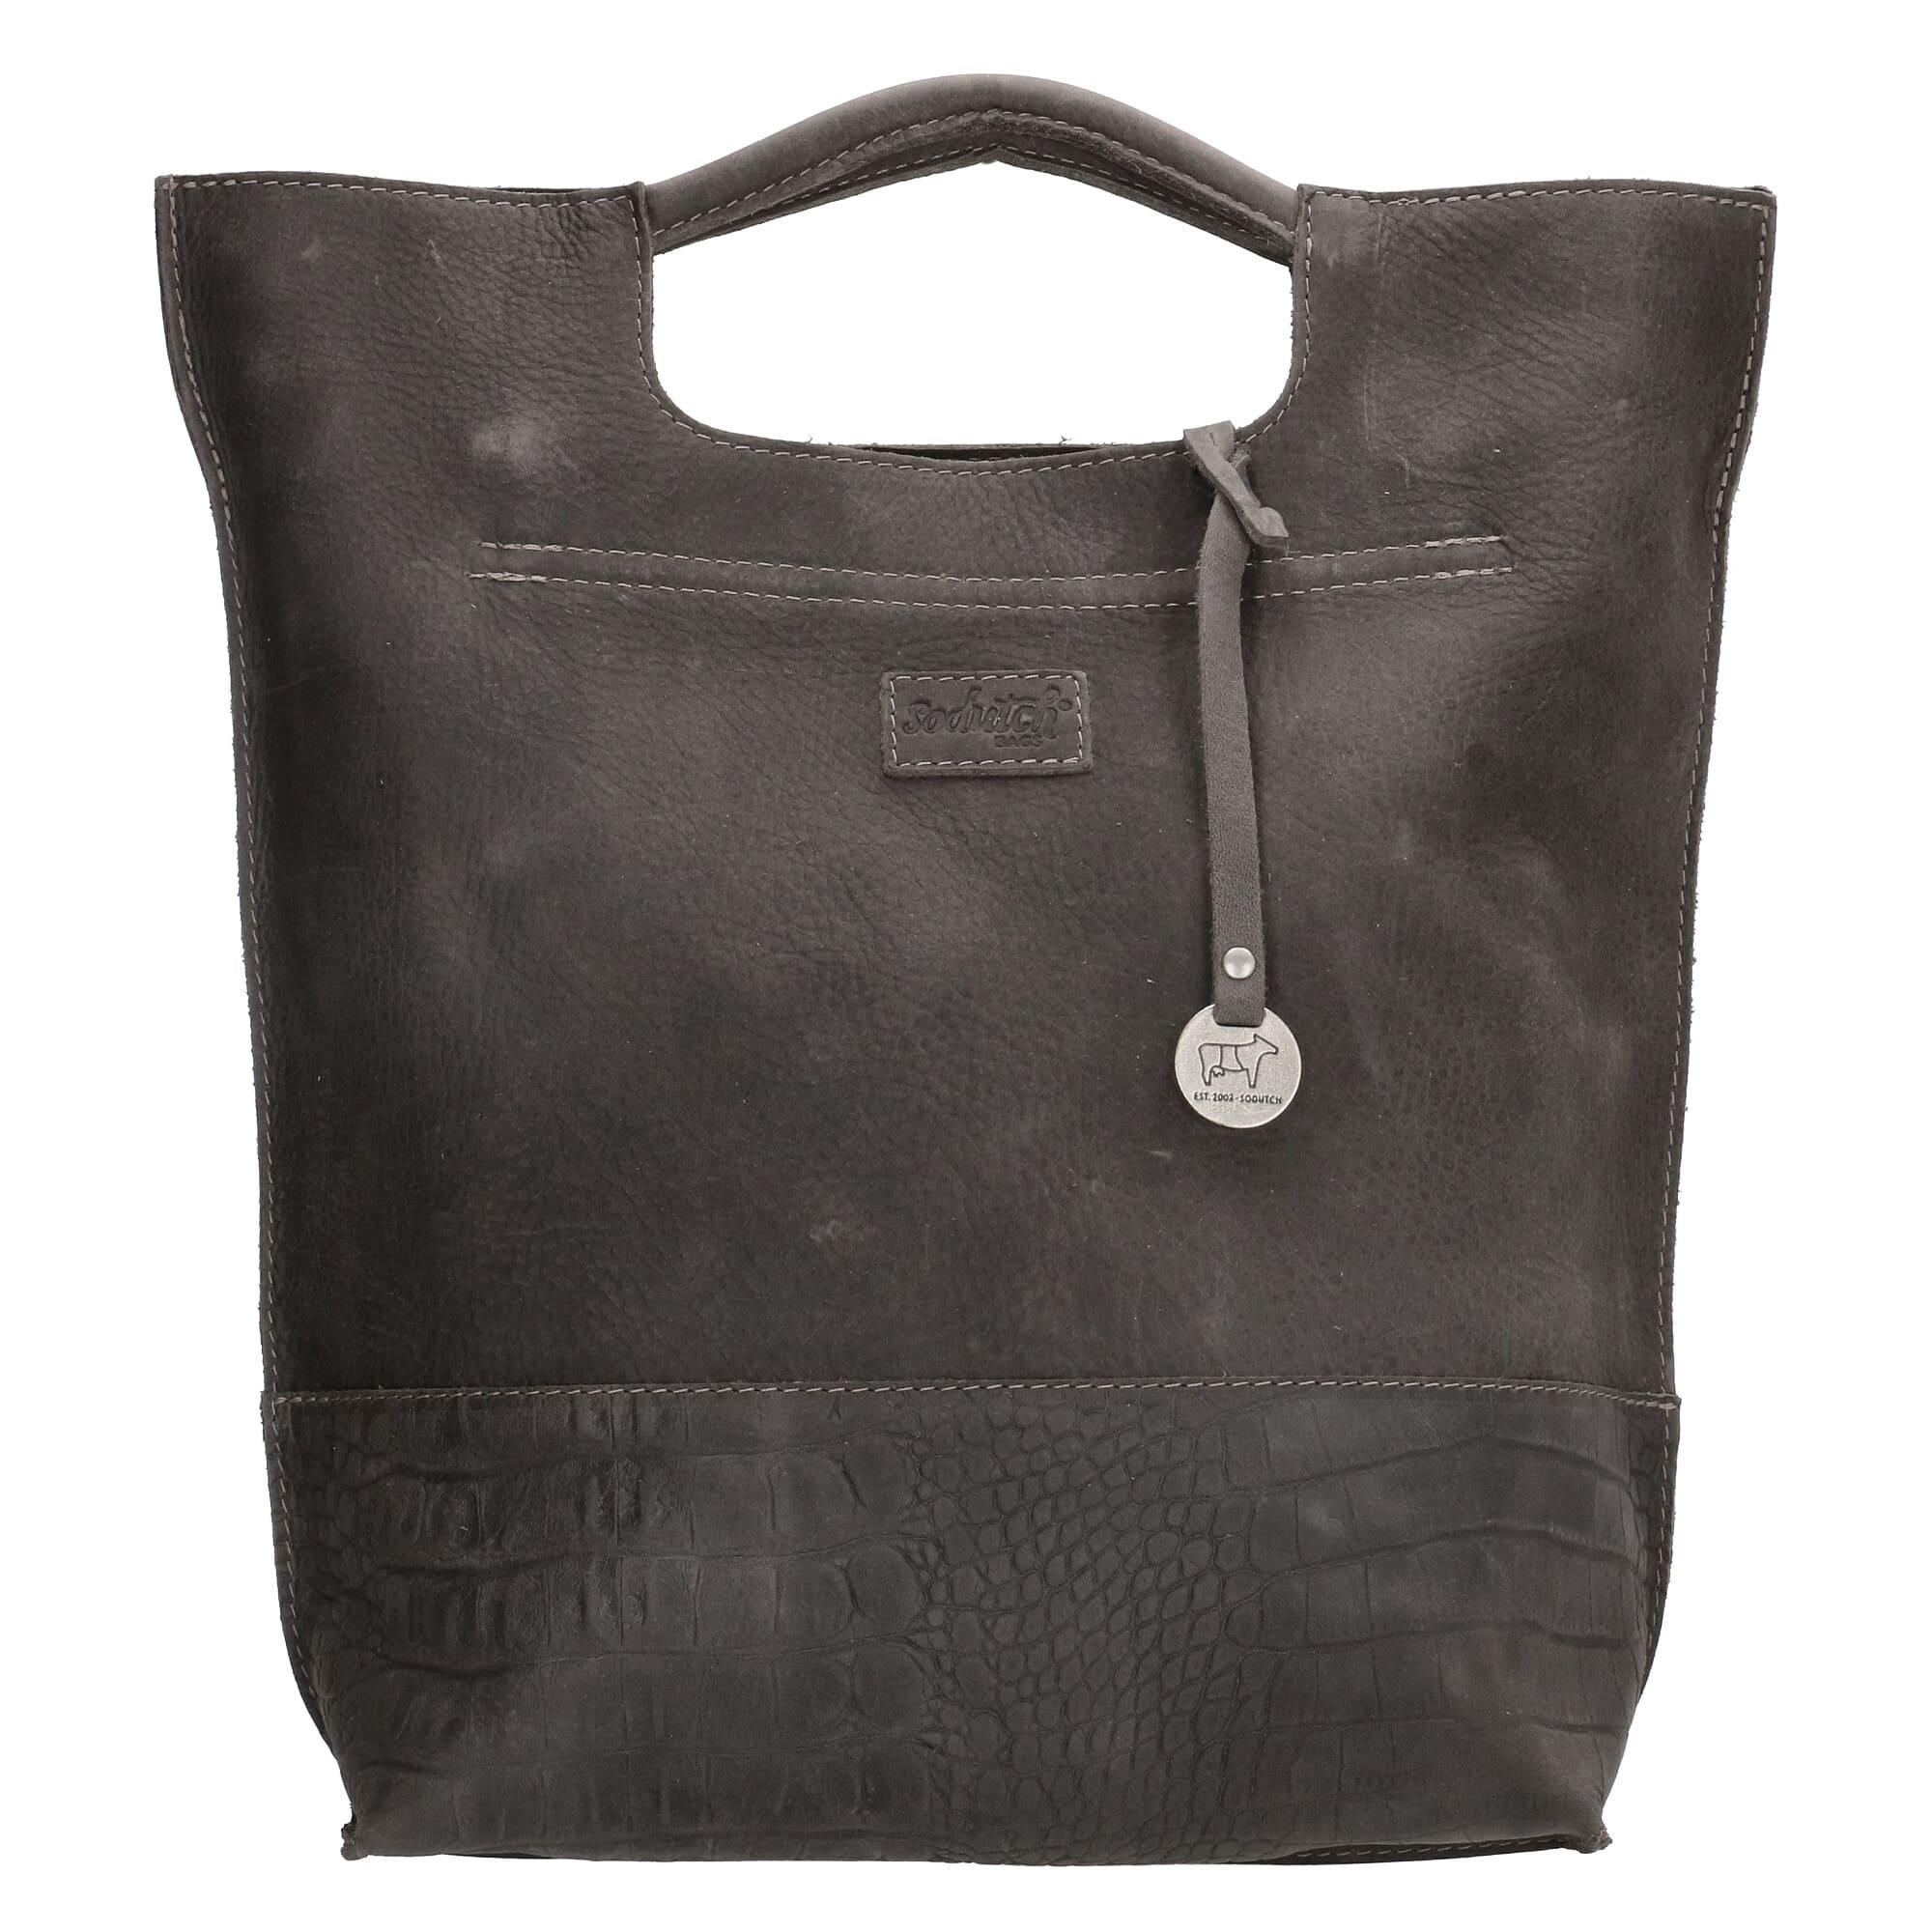 SoDutch Bags Handtas #08 Zwart